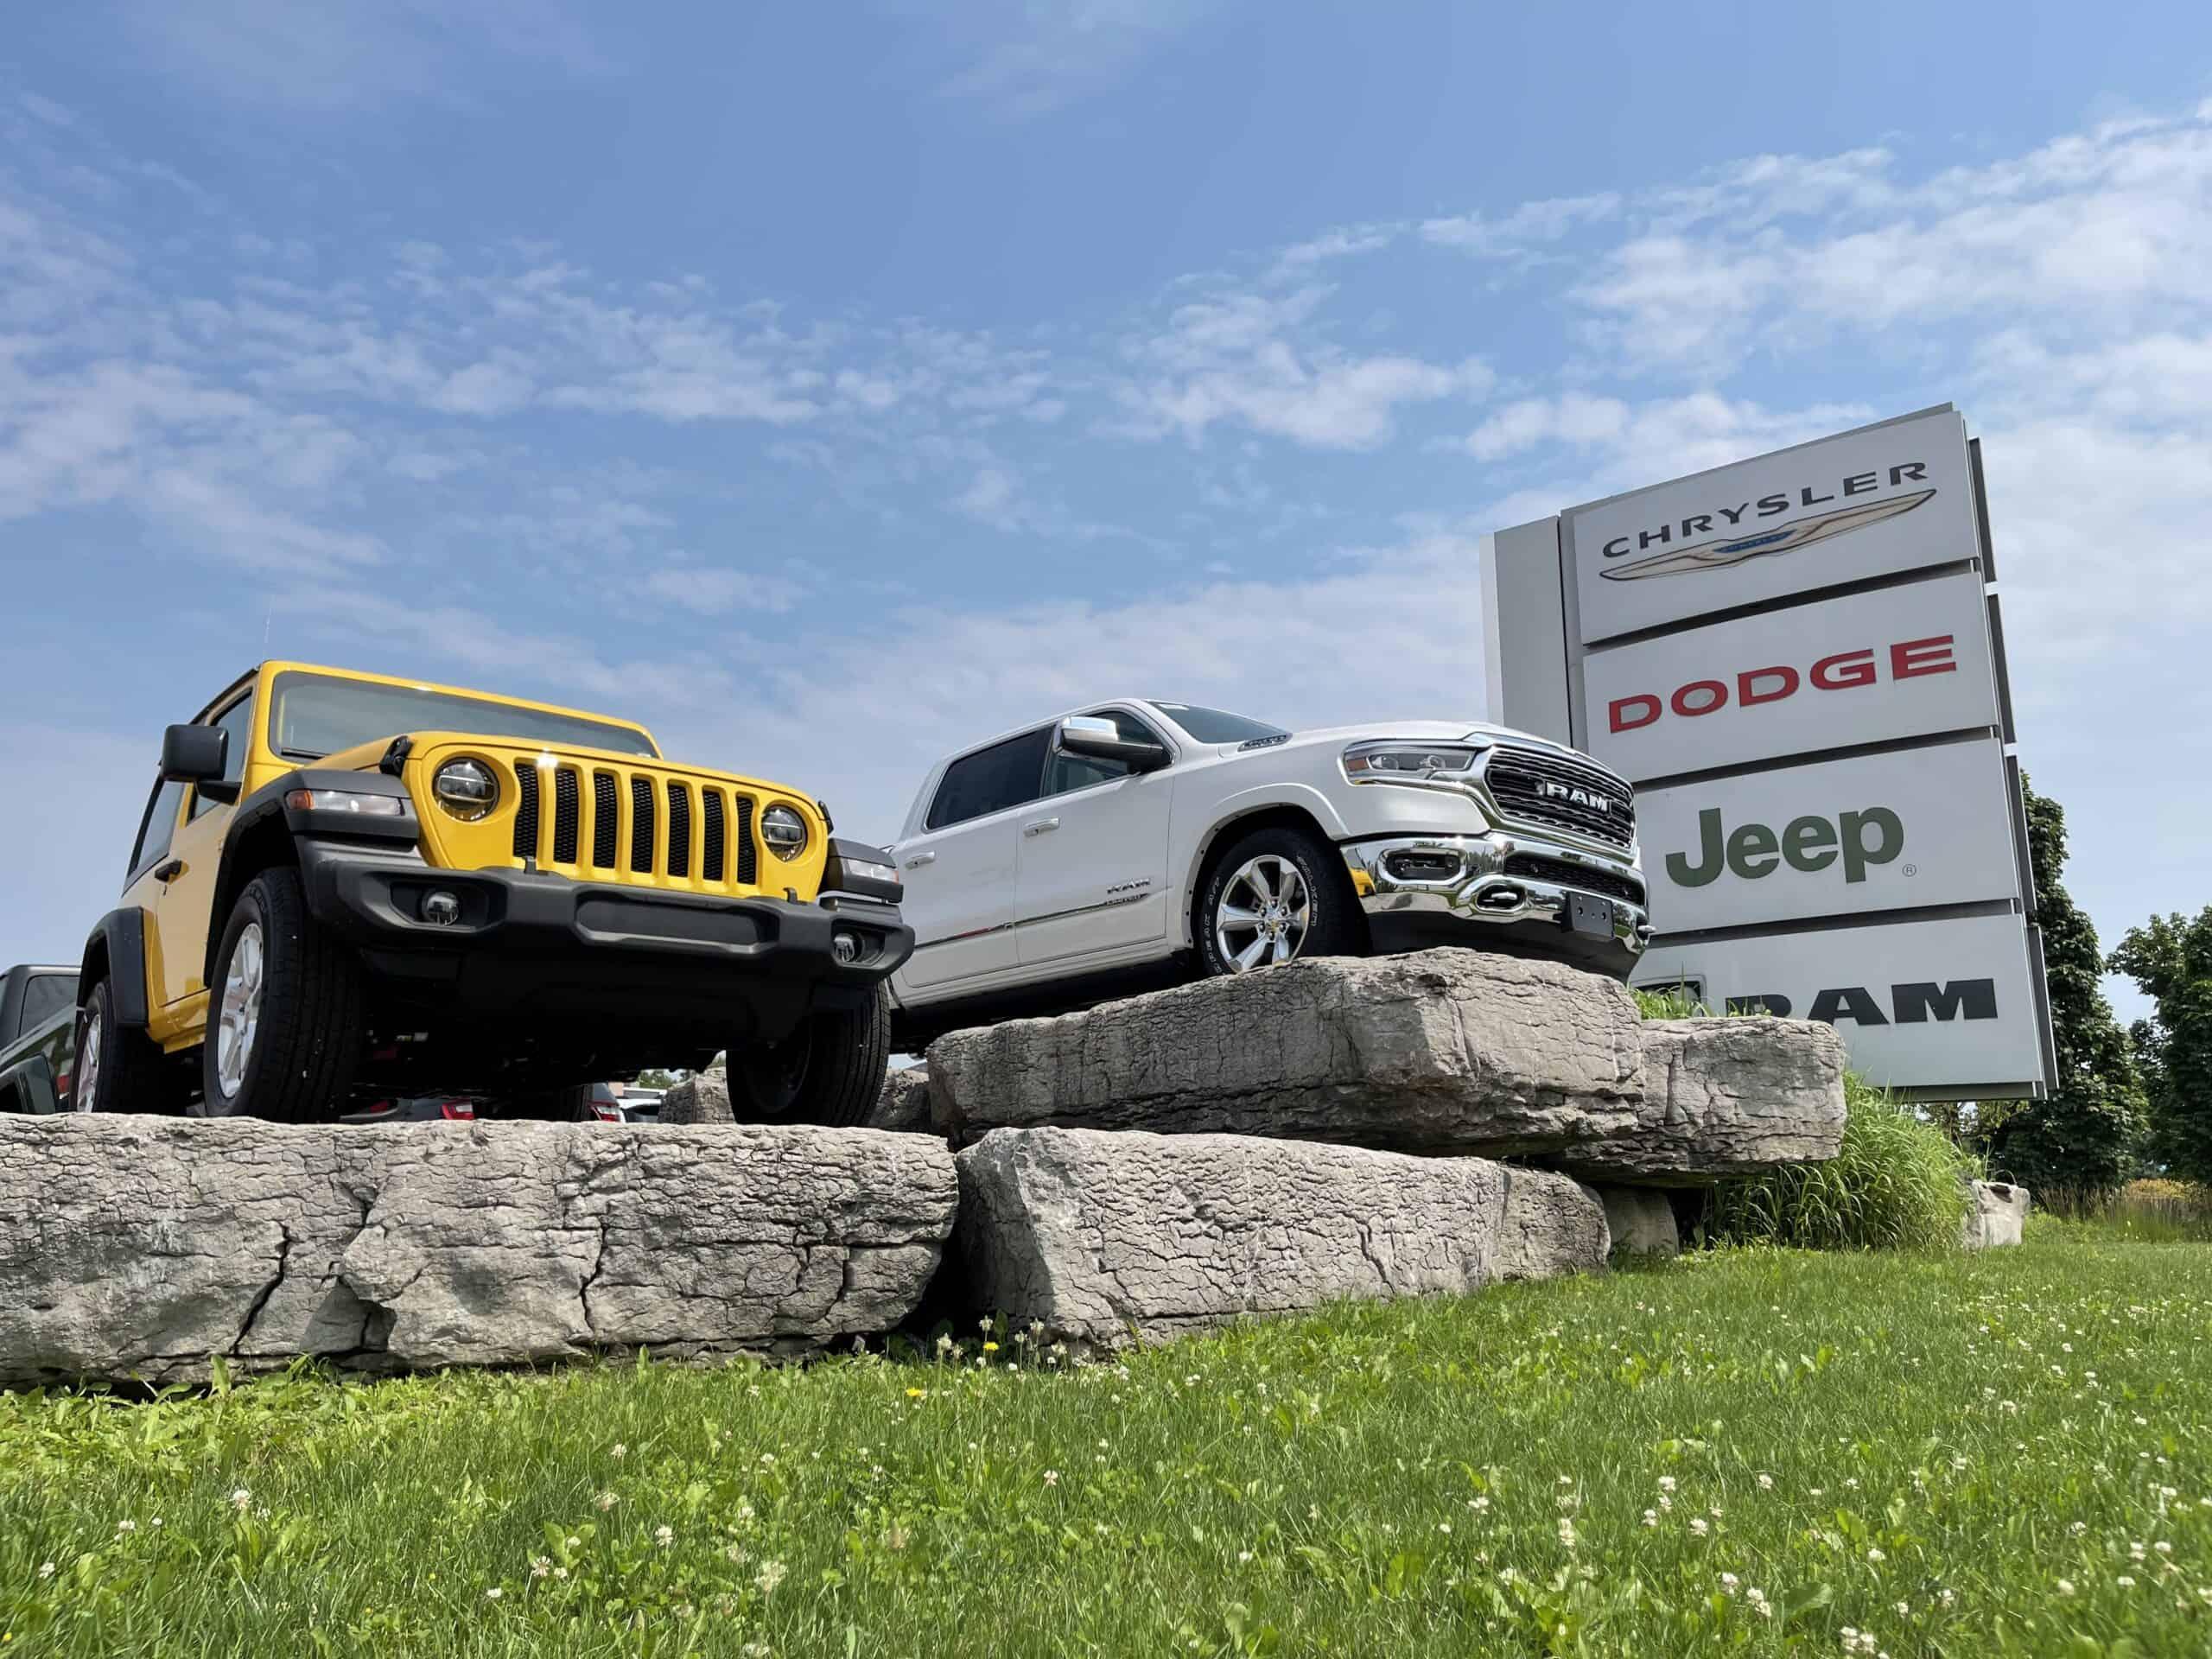 Pickering Chrysler Dodge Jeep Ram